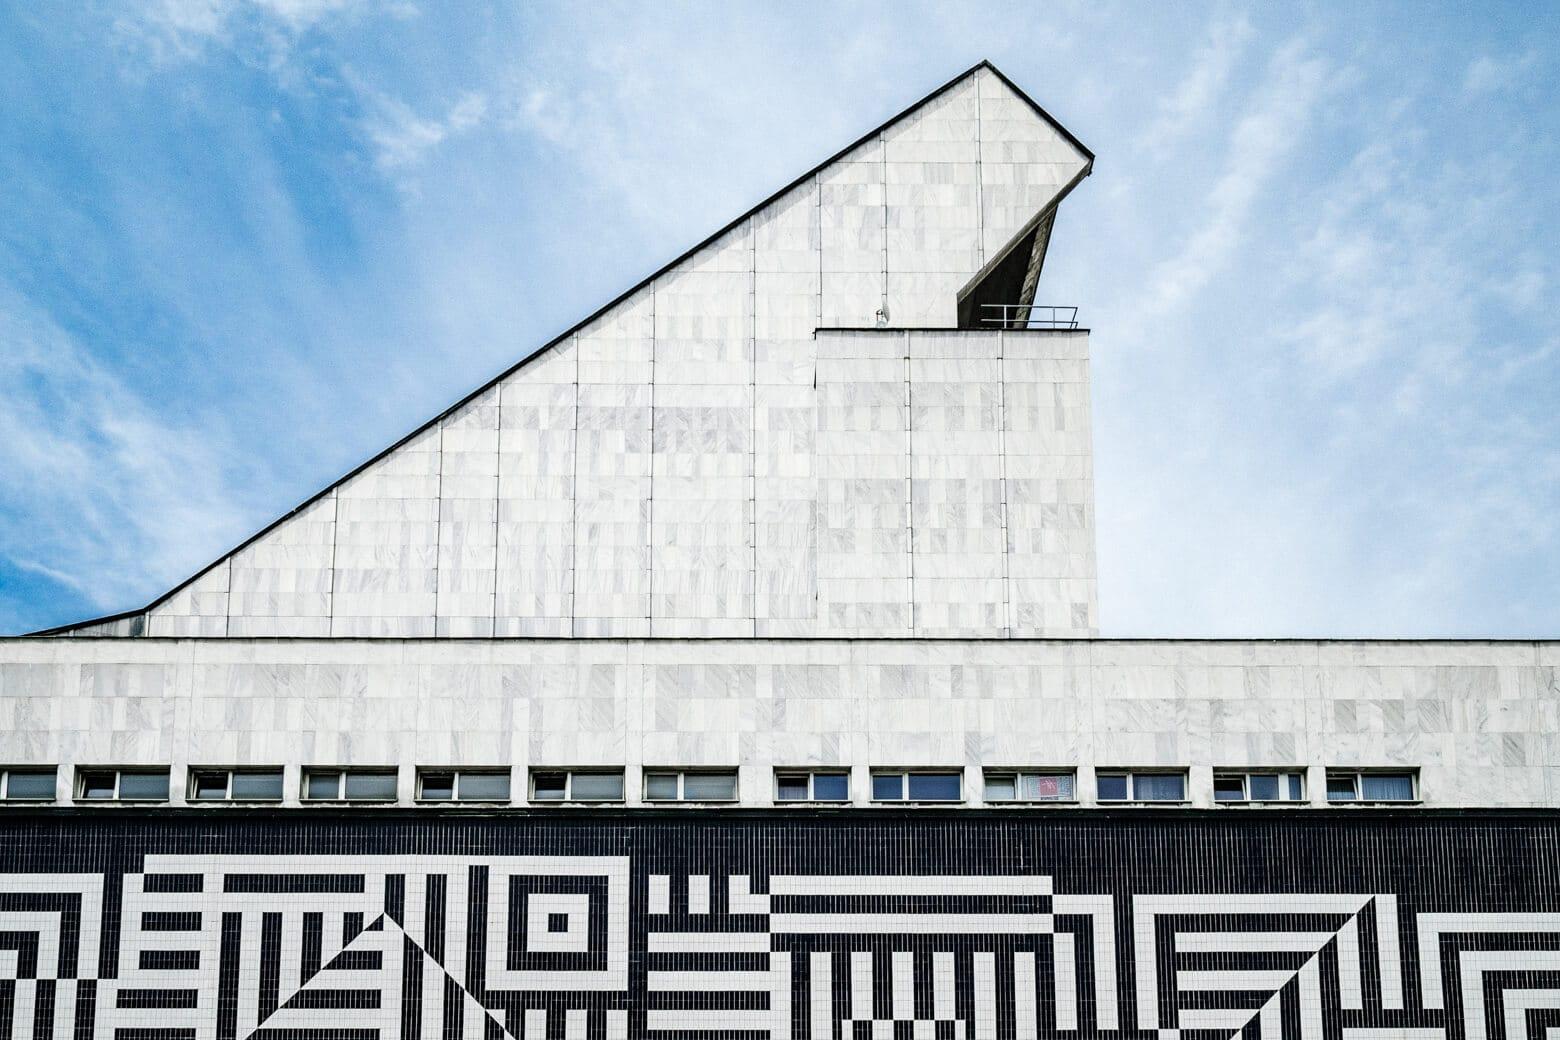 Gyor Architecture